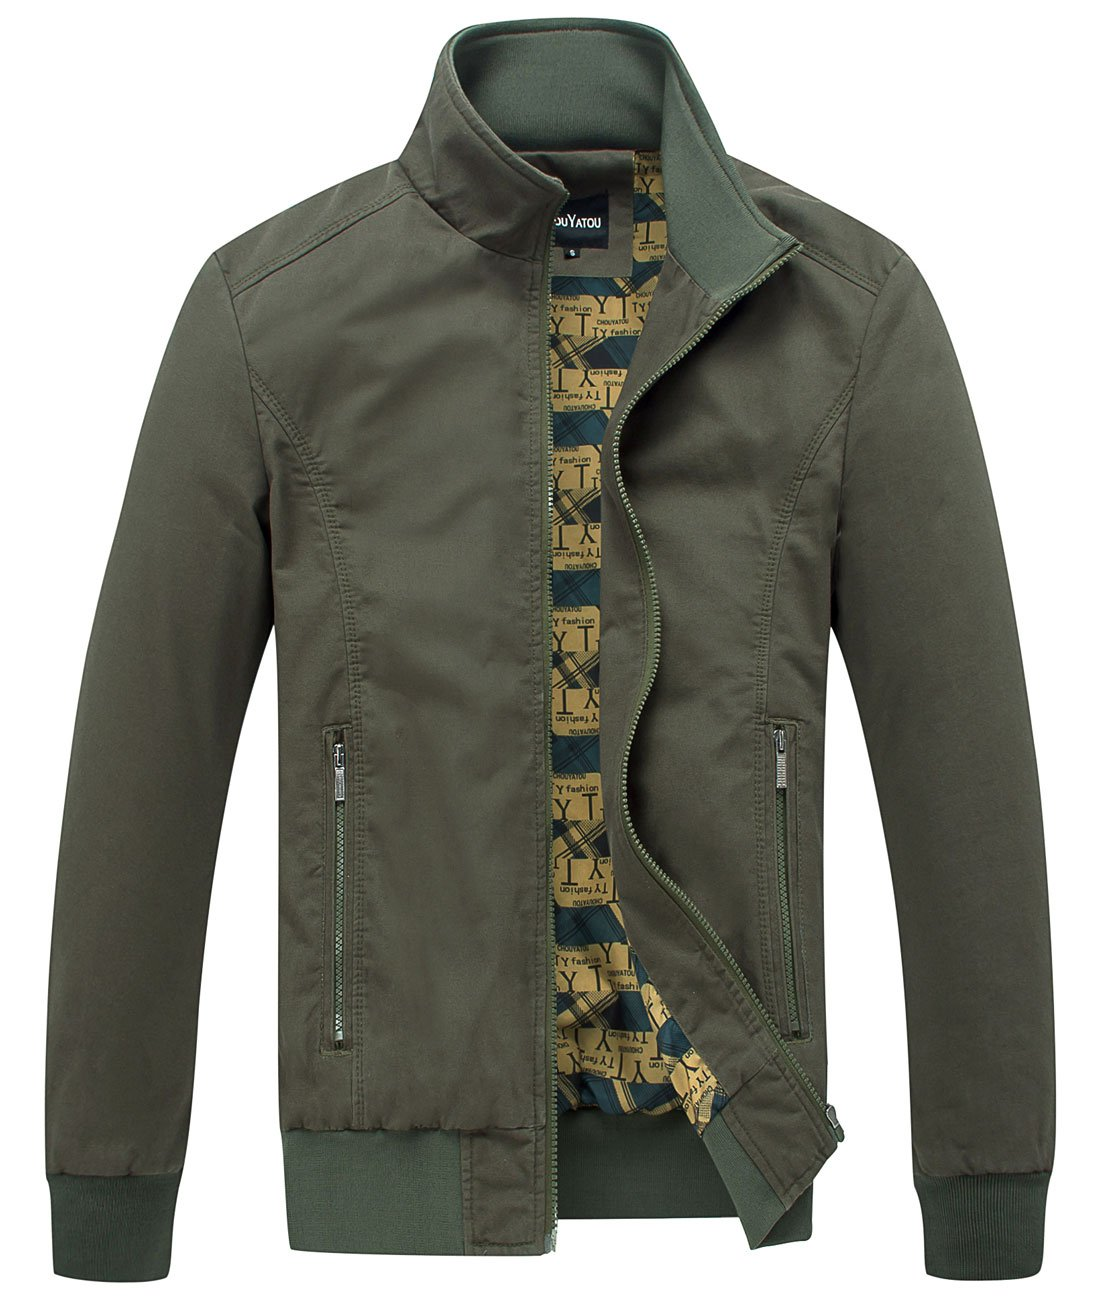 chouyatou Men's Essential Cotton Lightweight Bomber Jacket (Medium, Army) by chouyatou